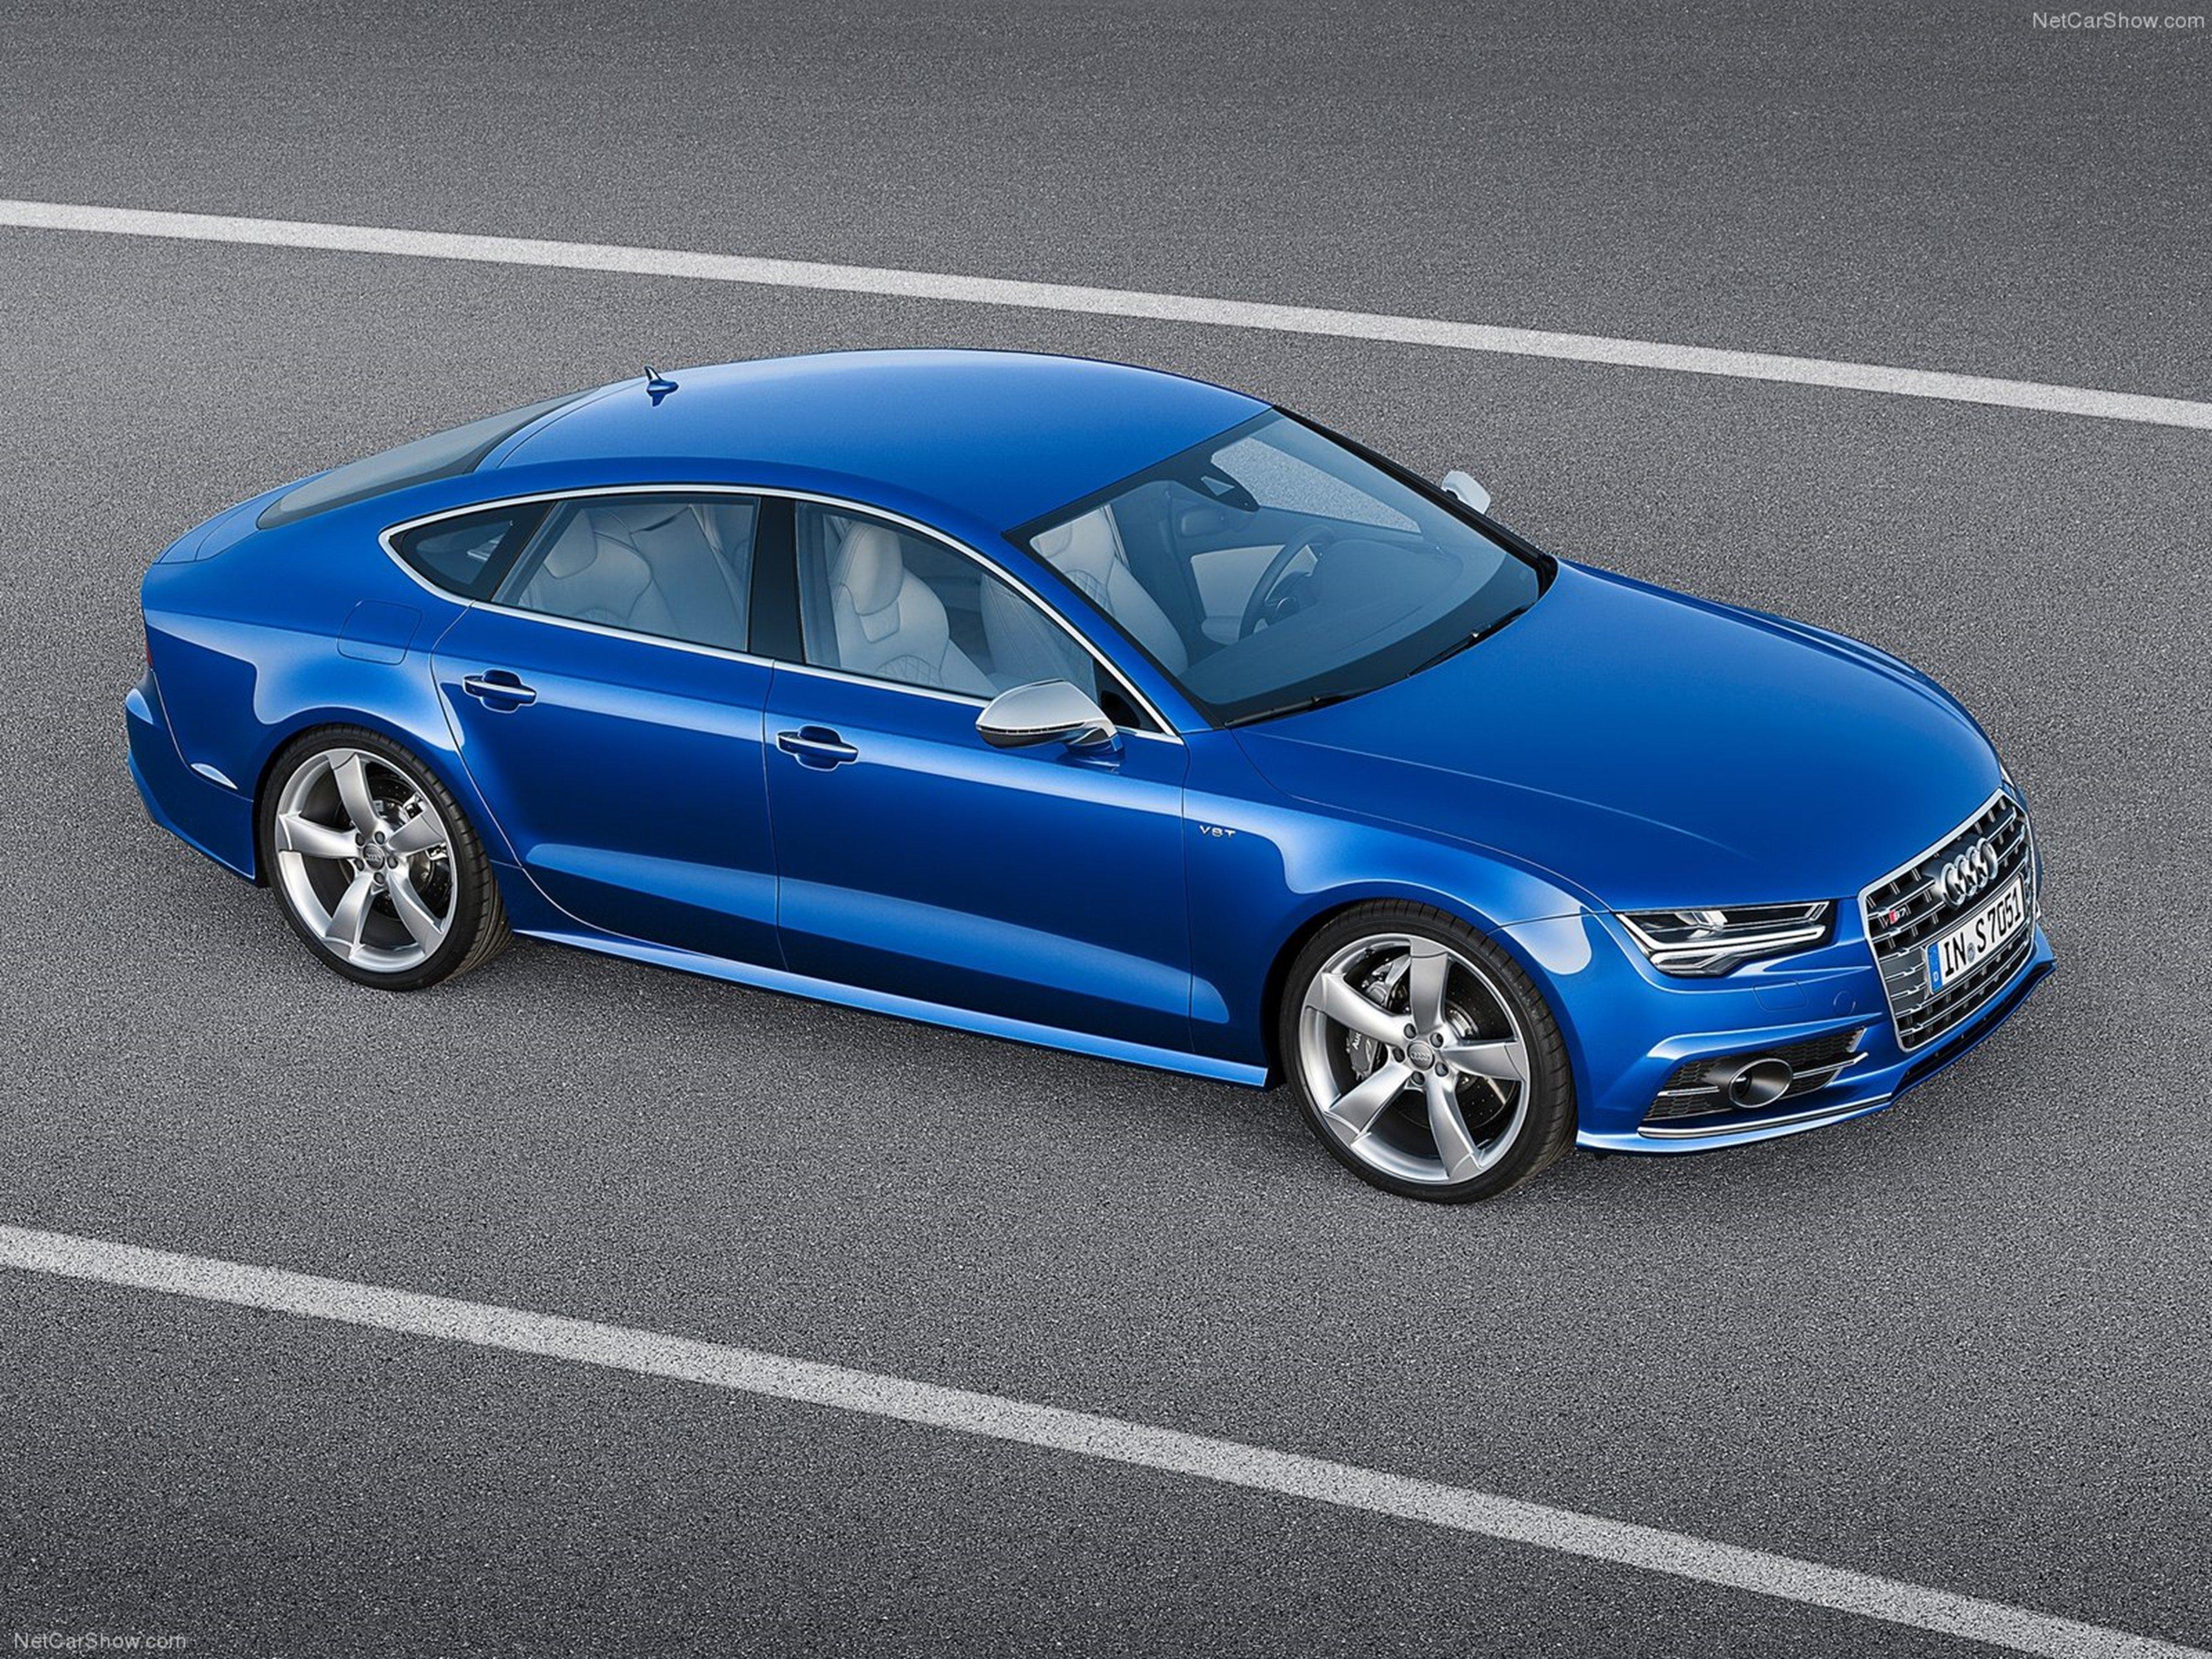 Audi S7 Sportback 2015 Car Germany Supercar Blue wallpaper 4000x3000 4000x3000